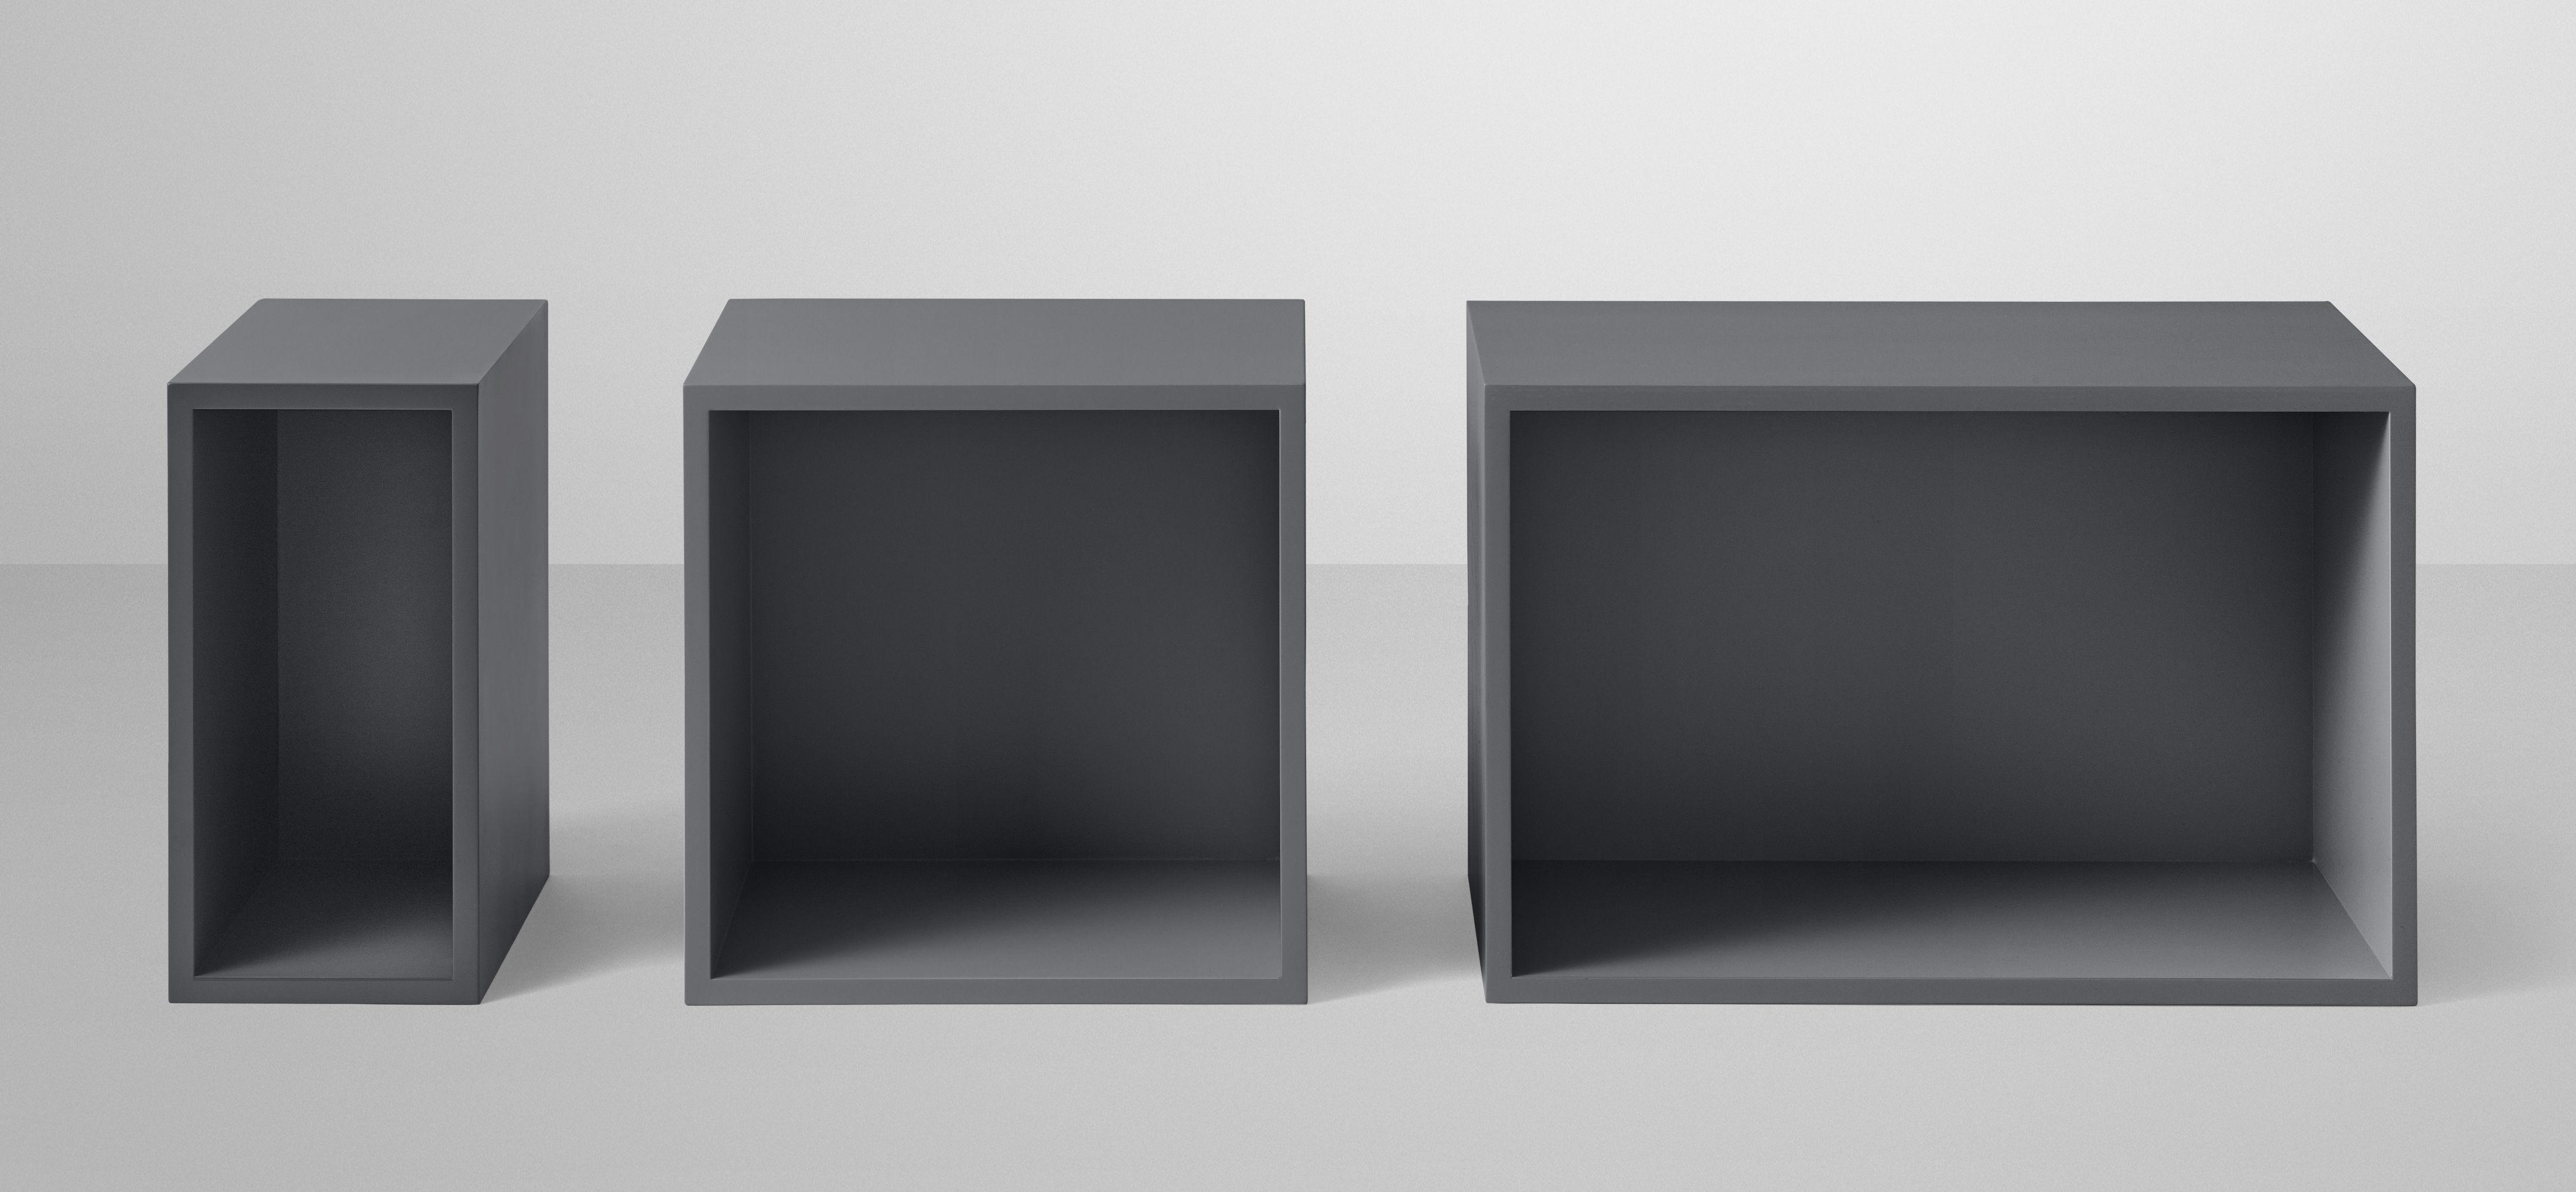 etag re stacked small rectangulaire 43x21 cm avec fond gris fonc muuto. Black Bedroom Furniture Sets. Home Design Ideas